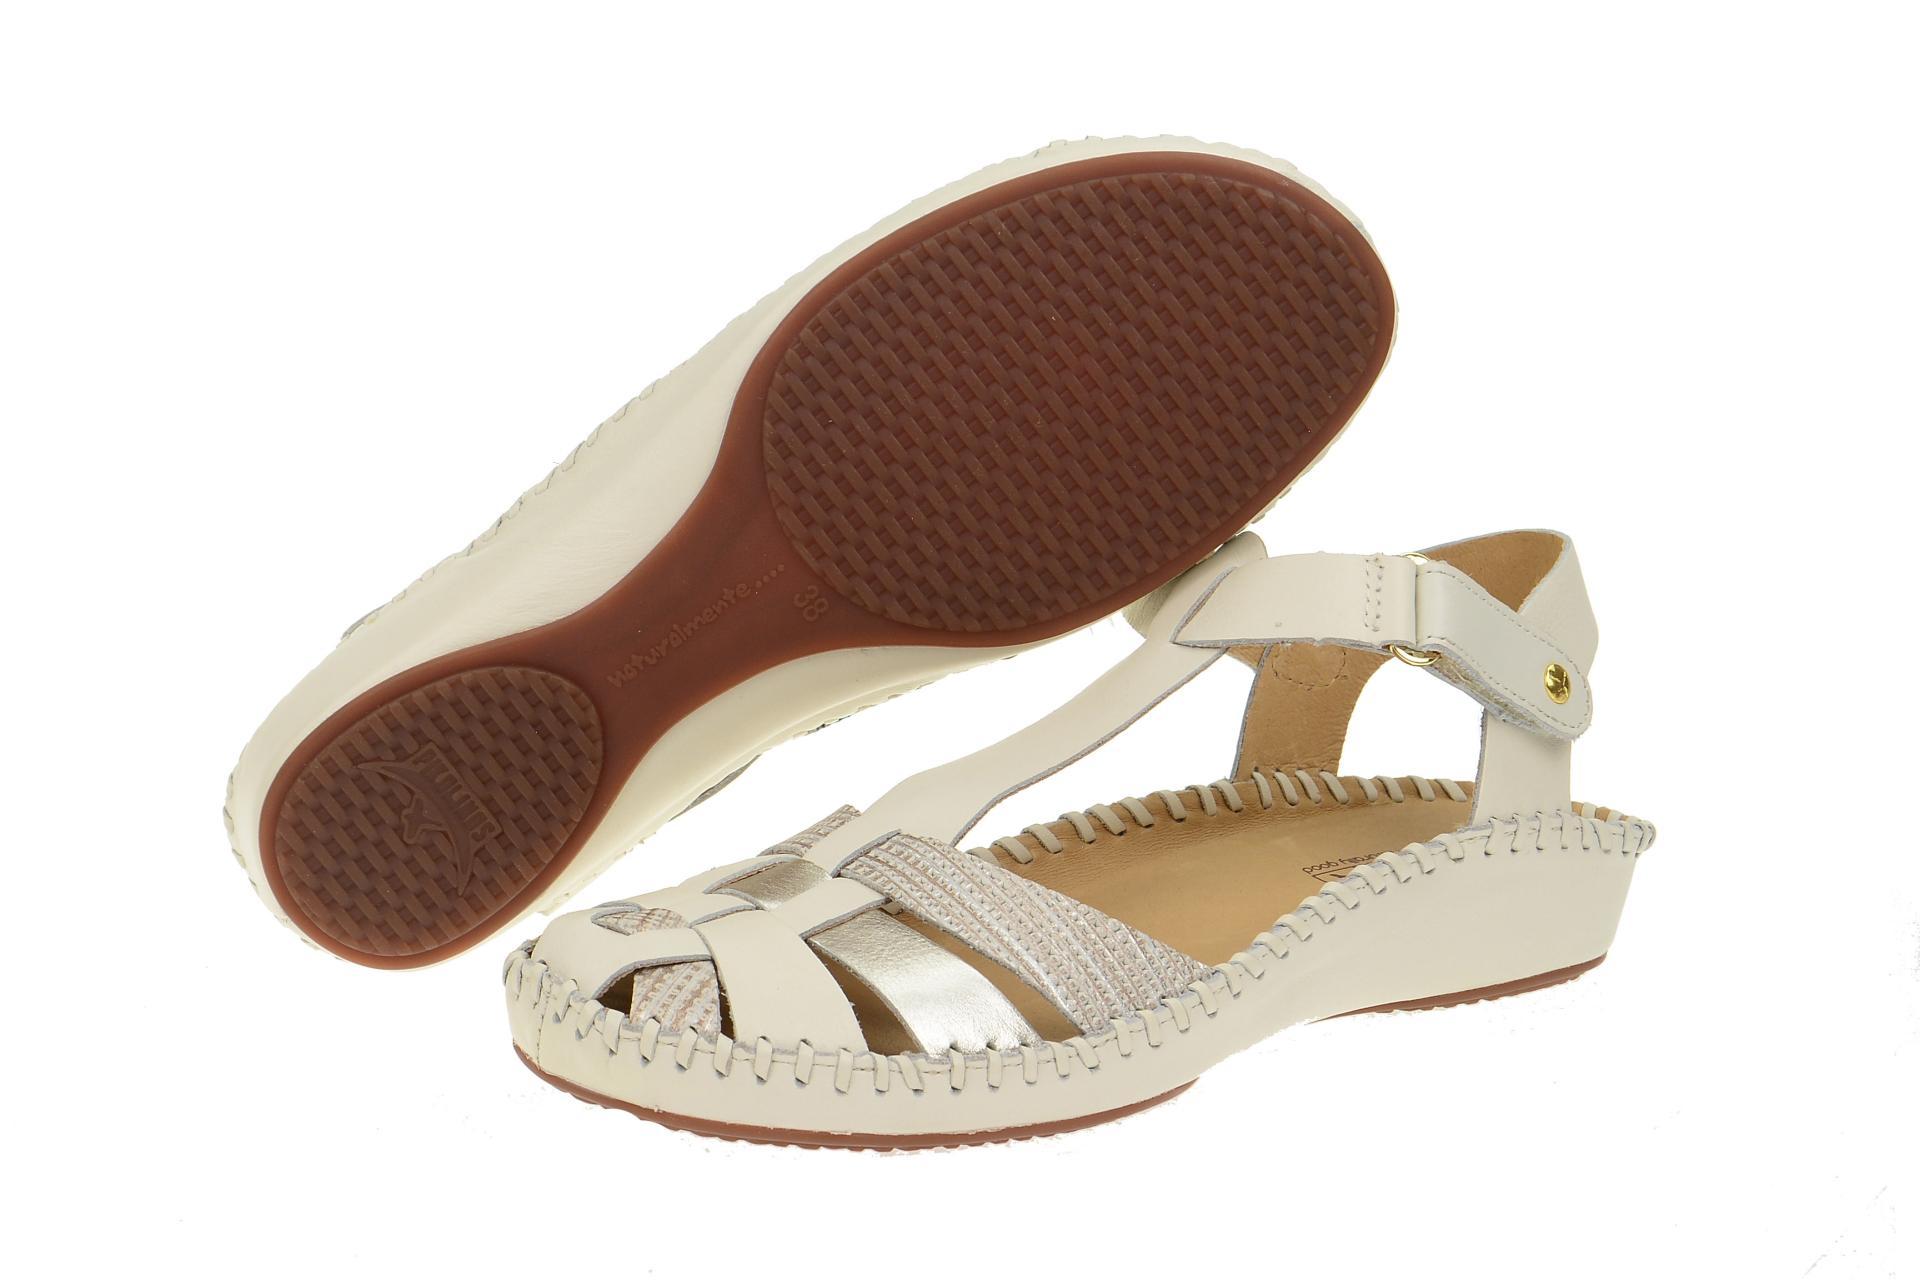 pikolinos schuhe vallarta wei damen sandale sandaletten 655 1540c1 nata neu ebay. Black Bedroom Furniture Sets. Home Design Ideas